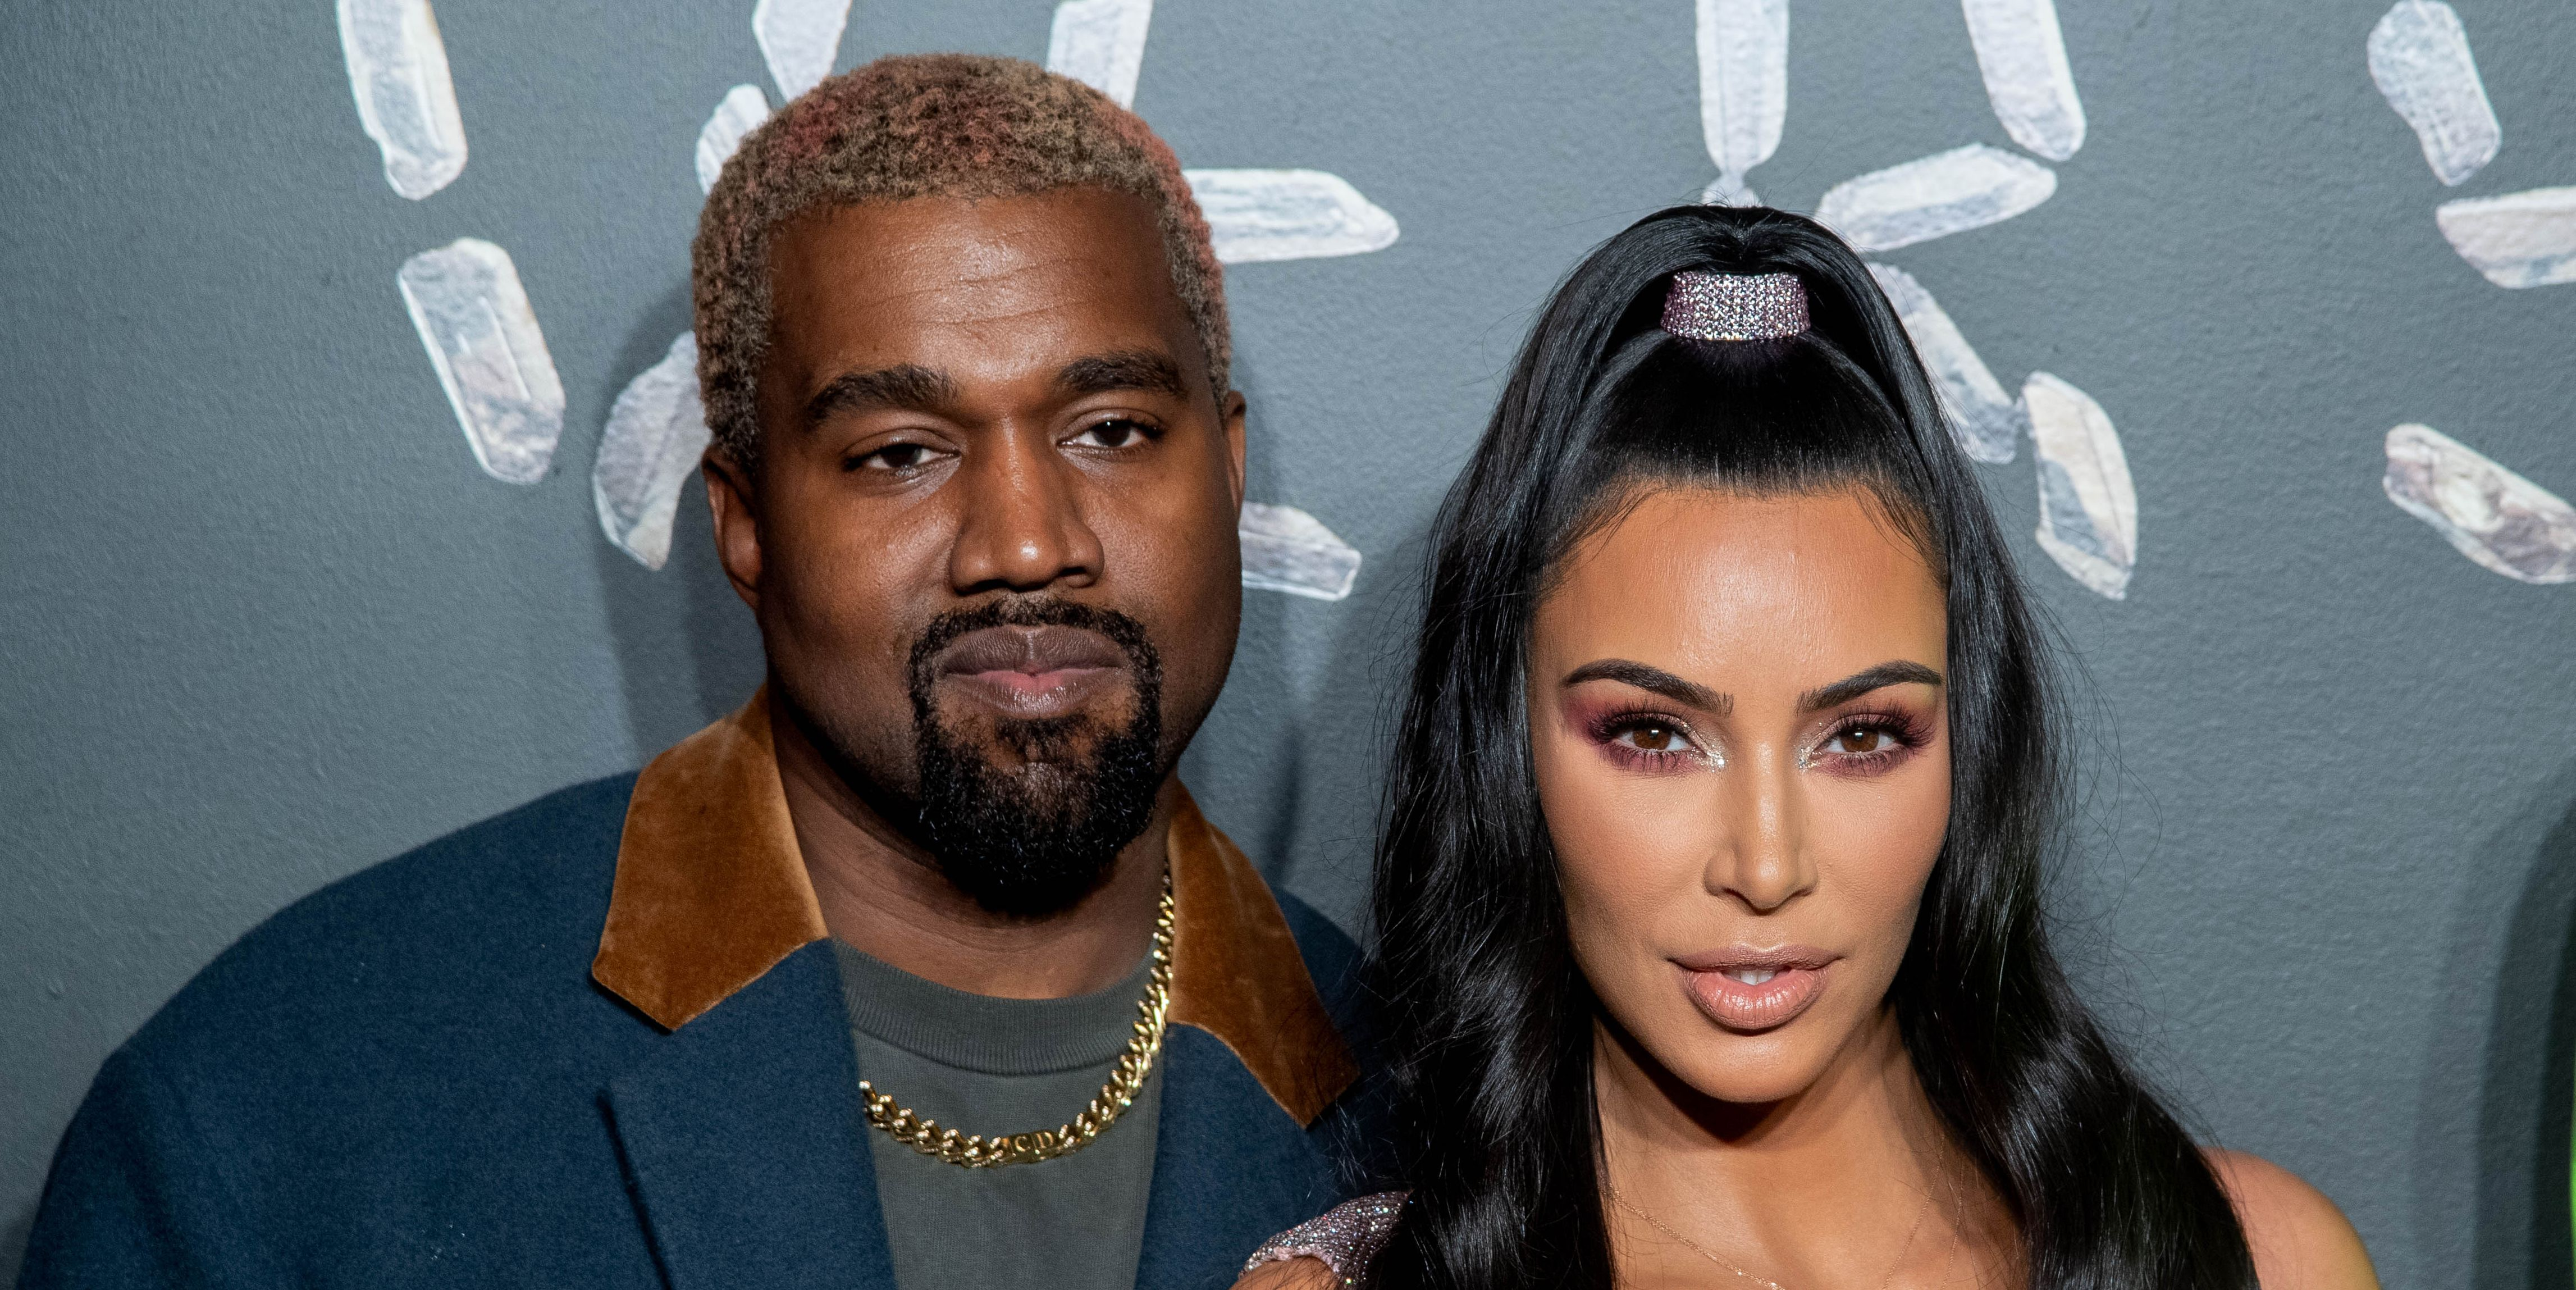 Kim Kardashian Just Confirmed She's Having A Baby Boy Via Surrogate